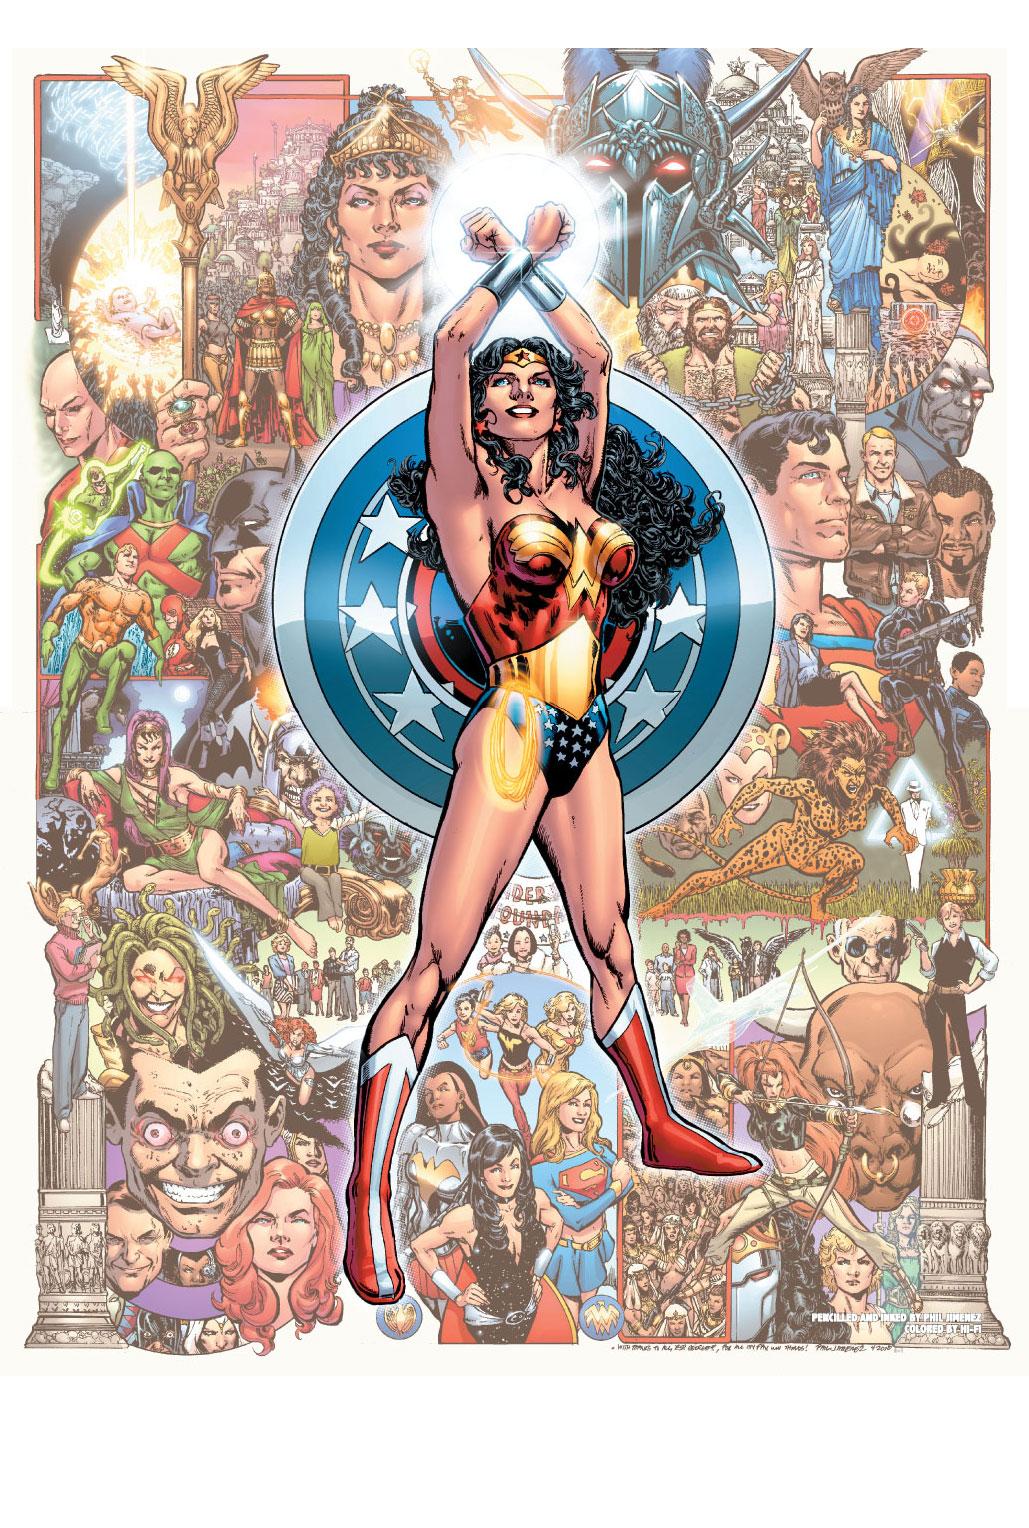 Comics Items Shipping June 30th